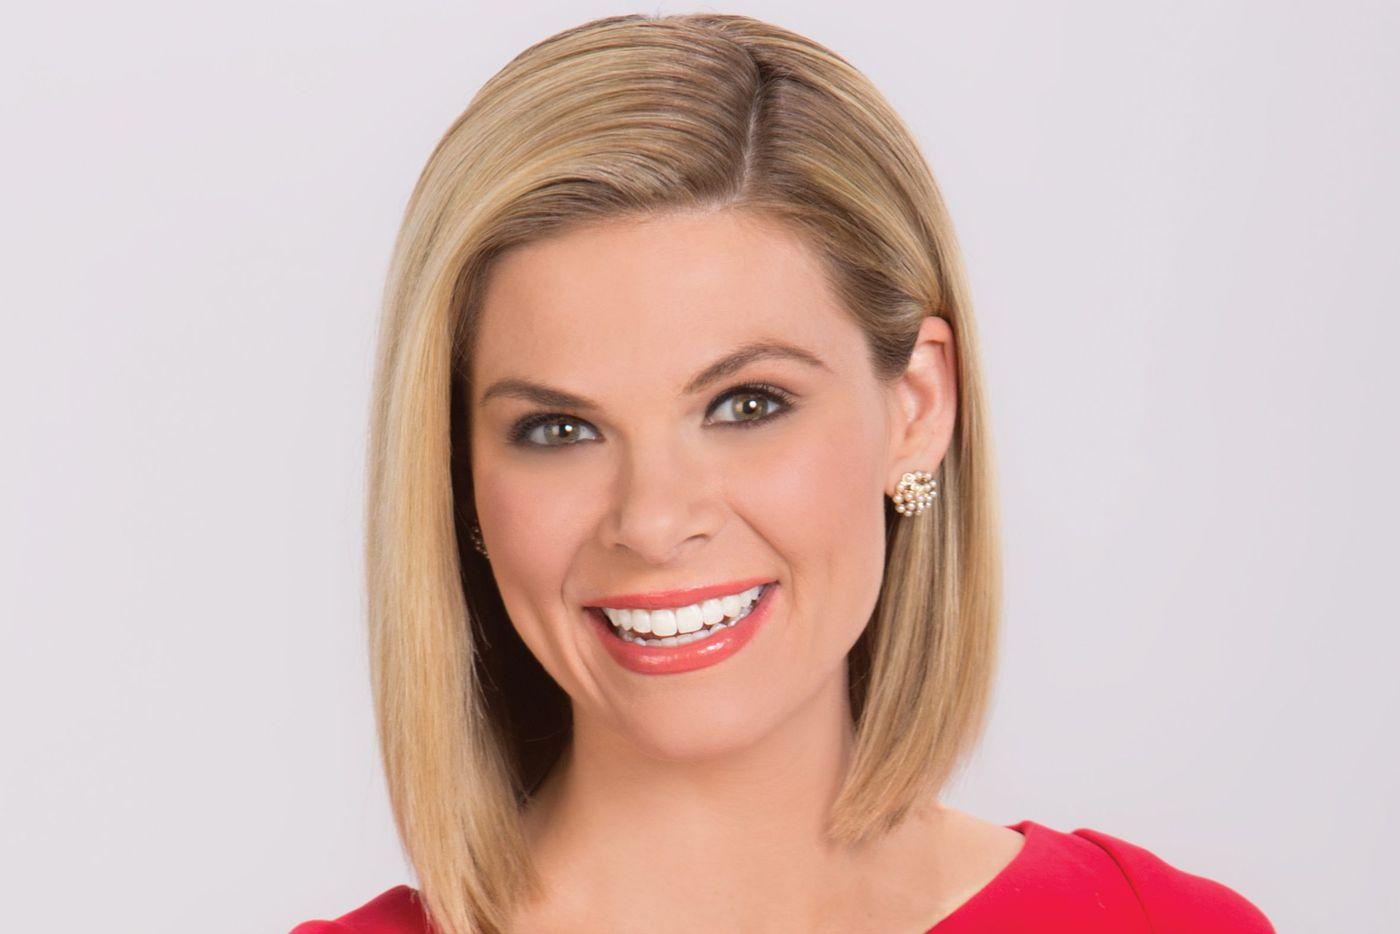 Ex-CBS3 anchor Jessica Dean lands at CNN